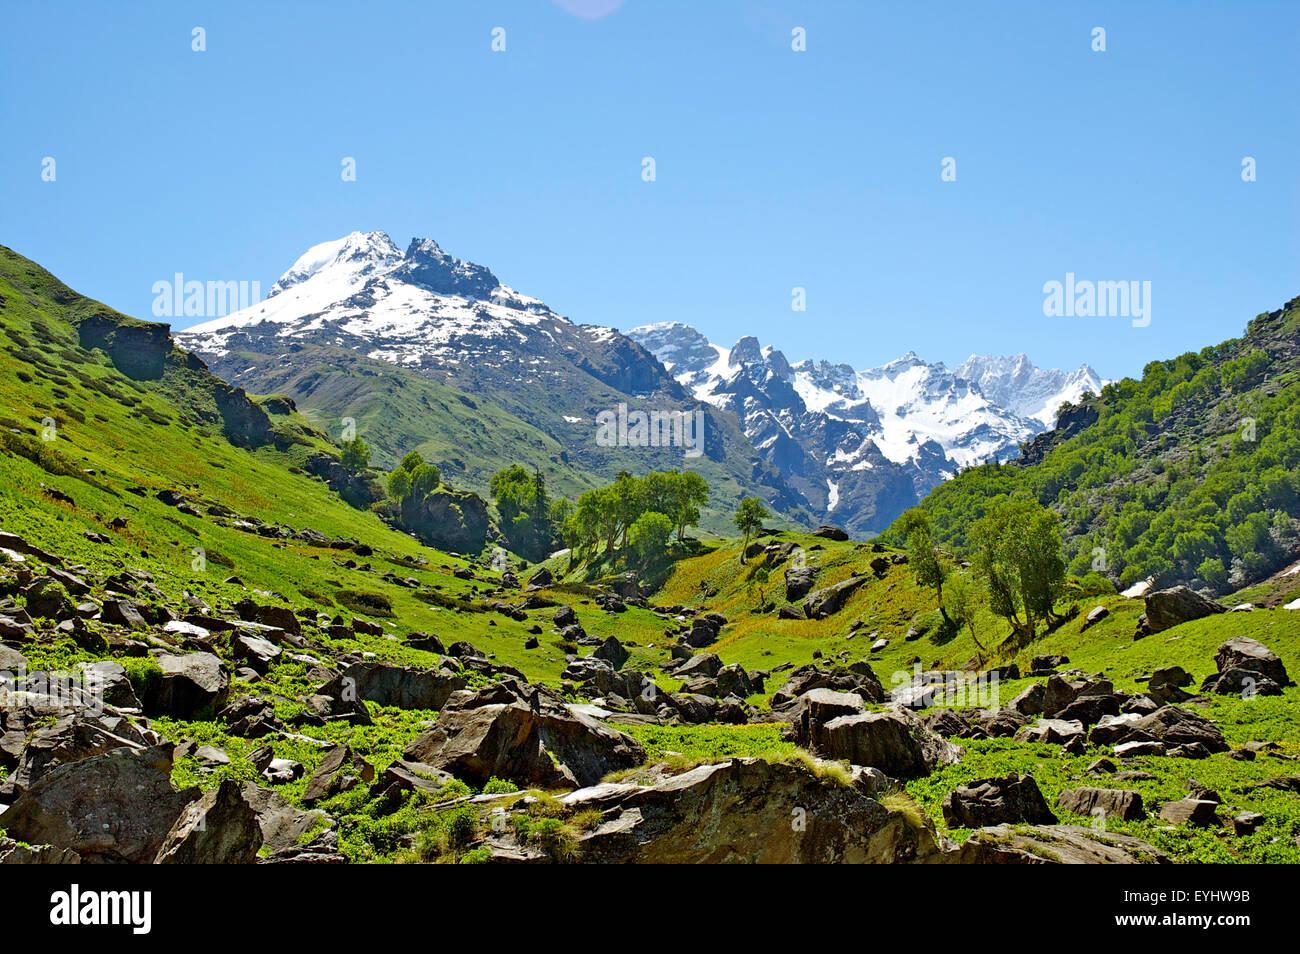 Landscape, Himachal Pradesh, India - Stock Image